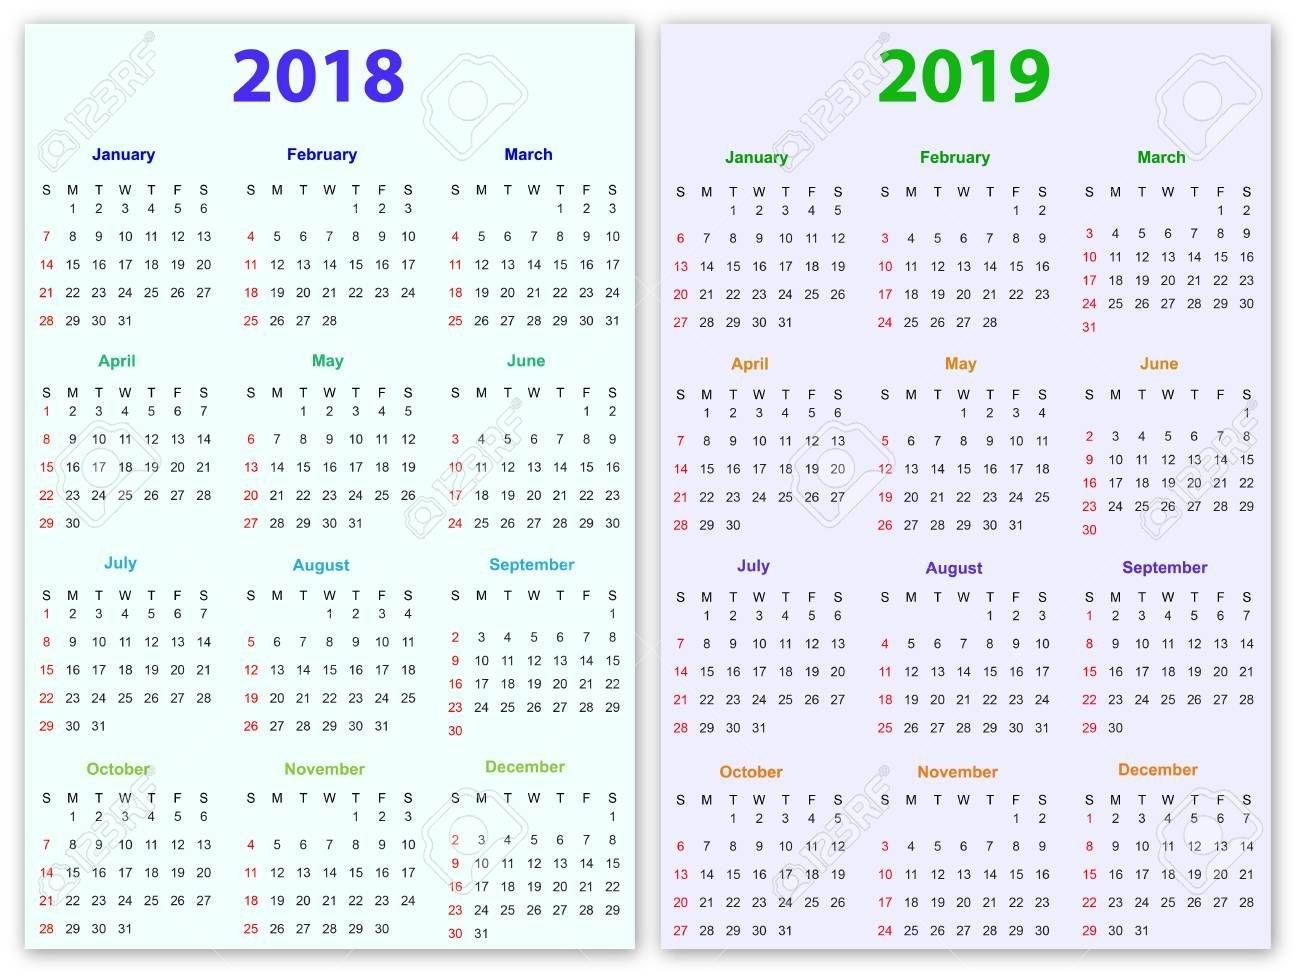 12 Months Calendar Design 2018-2019 Printable And Editable.